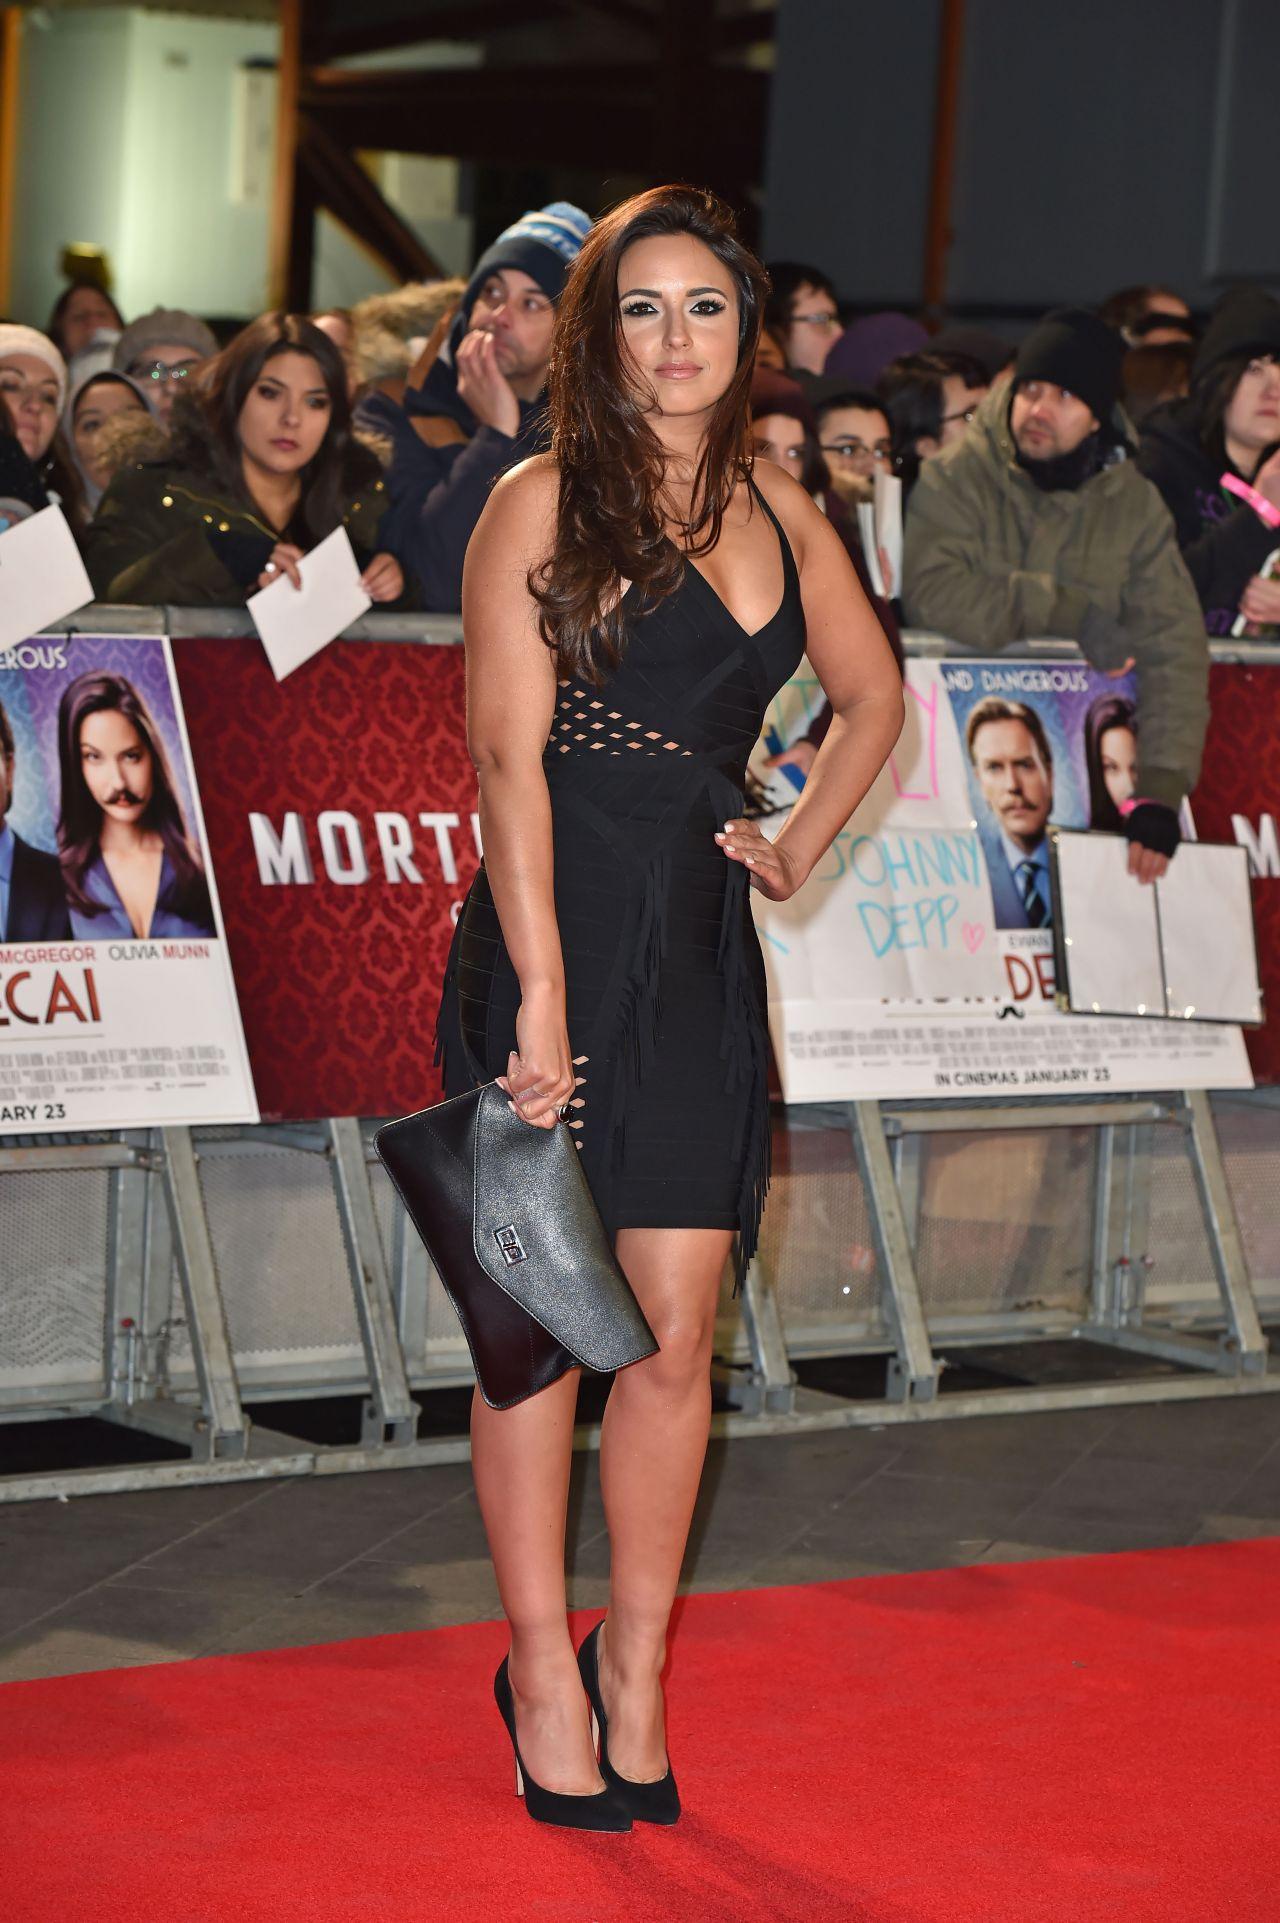 Nadia Forde Mortdecai Premiere In London